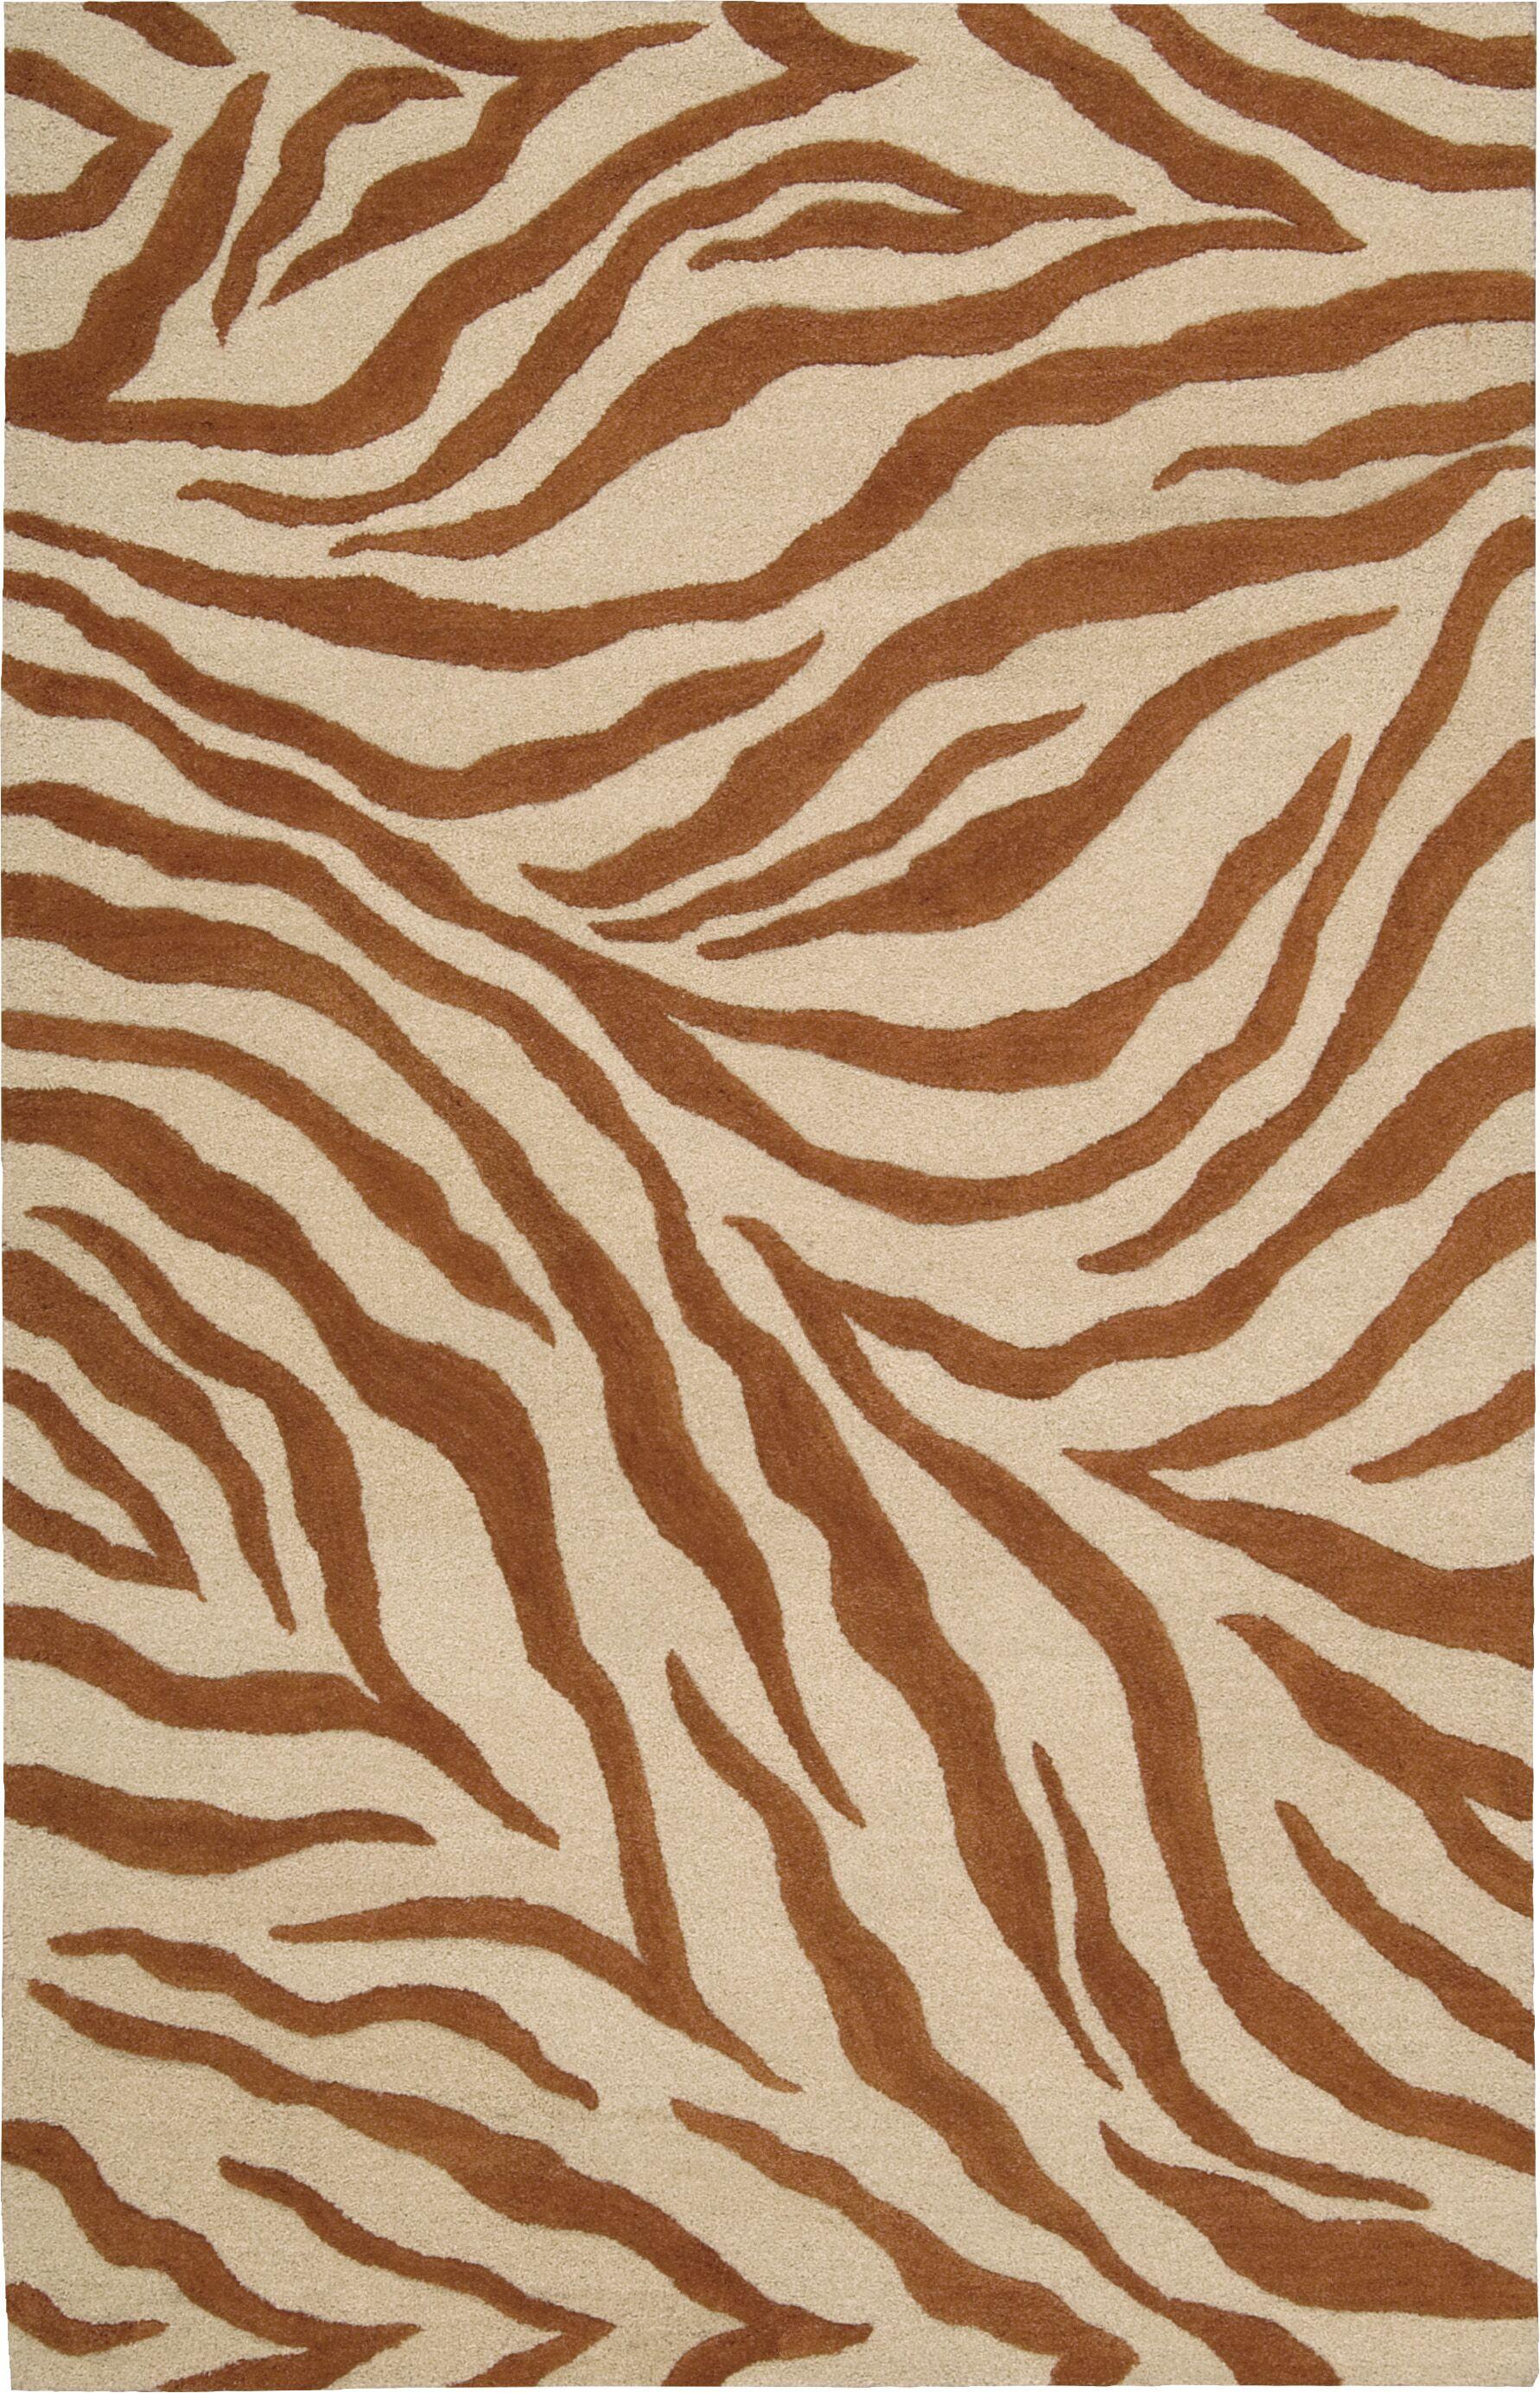 Goulmima Ivory/Rust Area Rug Rug Size: Rectangle 8' x 11'